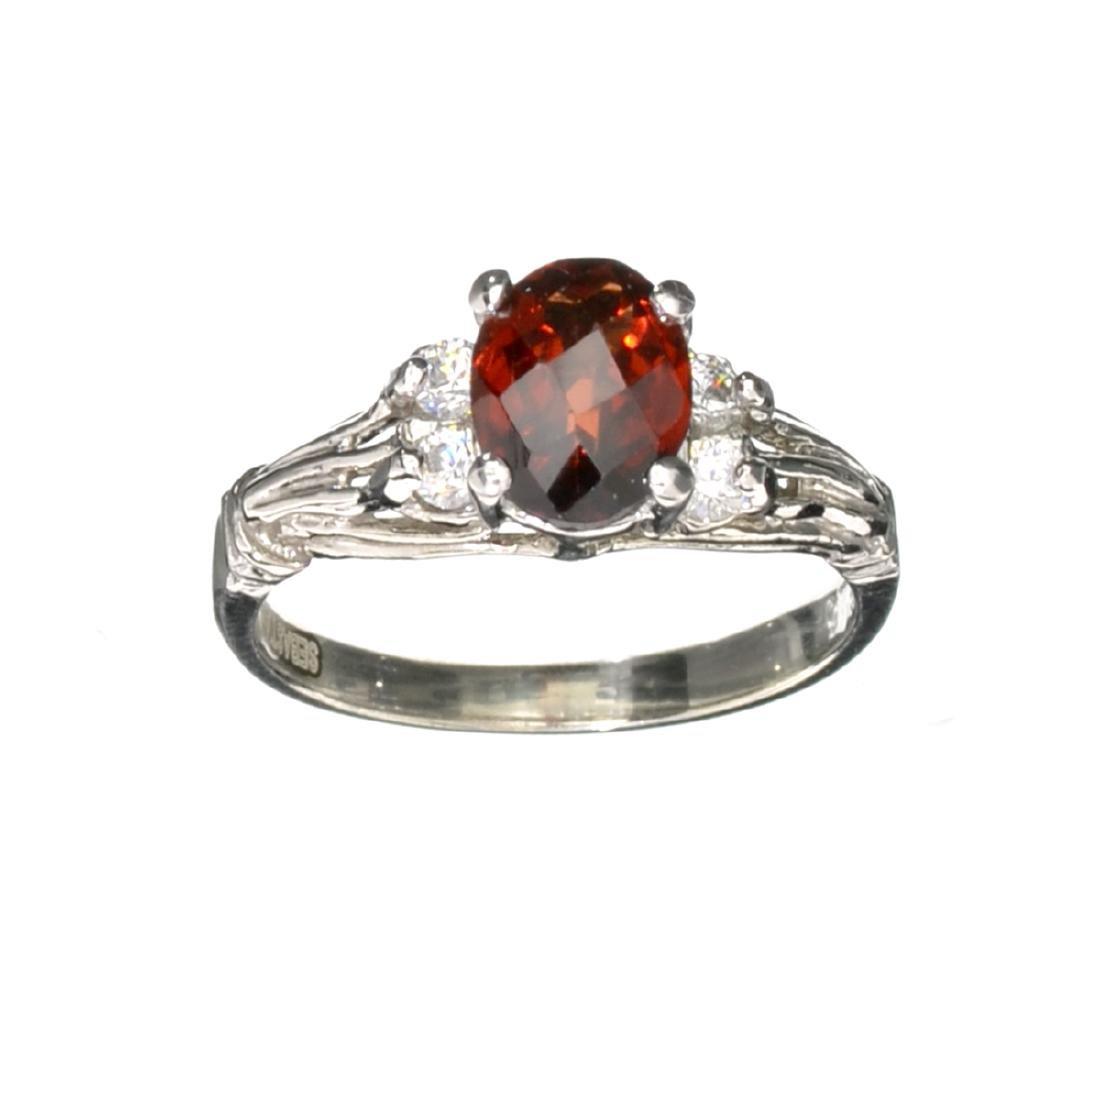 Fine Jewelry Designer Sebastian 1.84CT Almandite Garnet